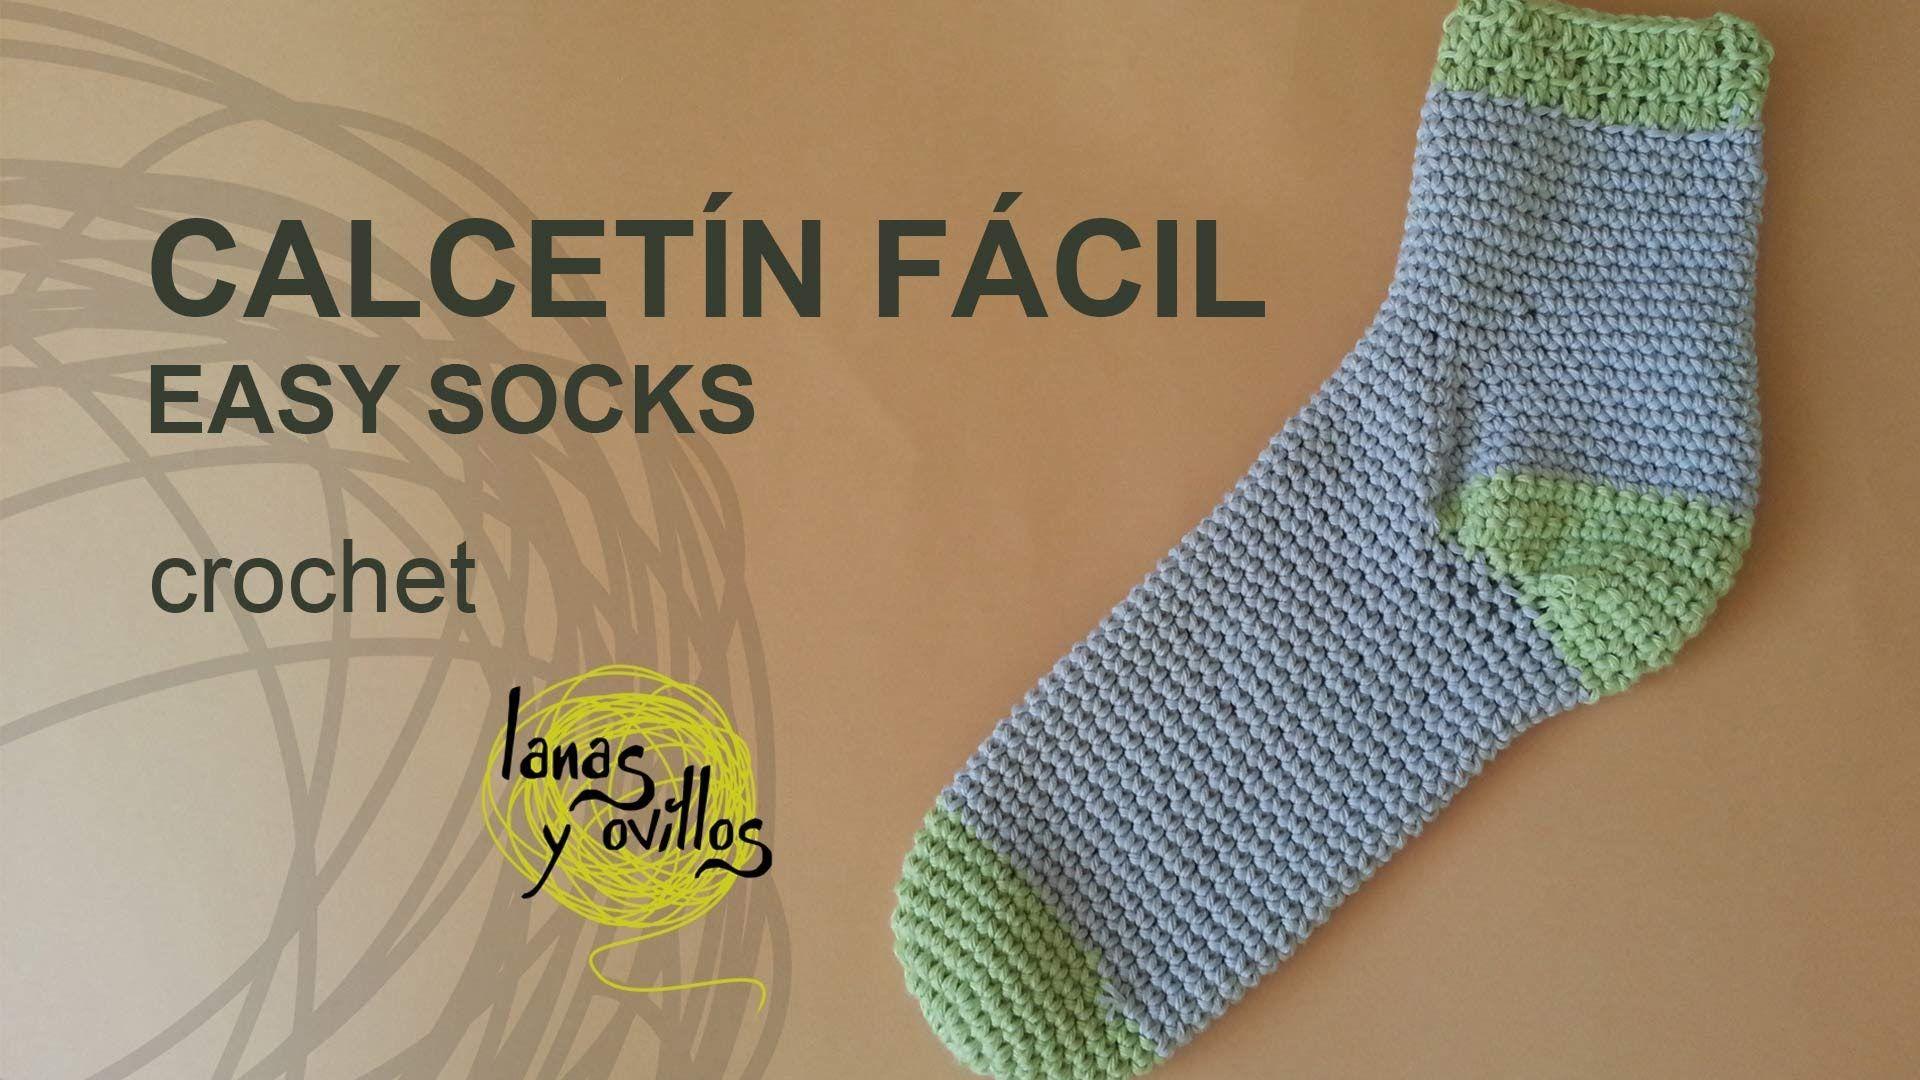 Tutorial Calcetines Crochet Fácil | Crochet stitches videos ...